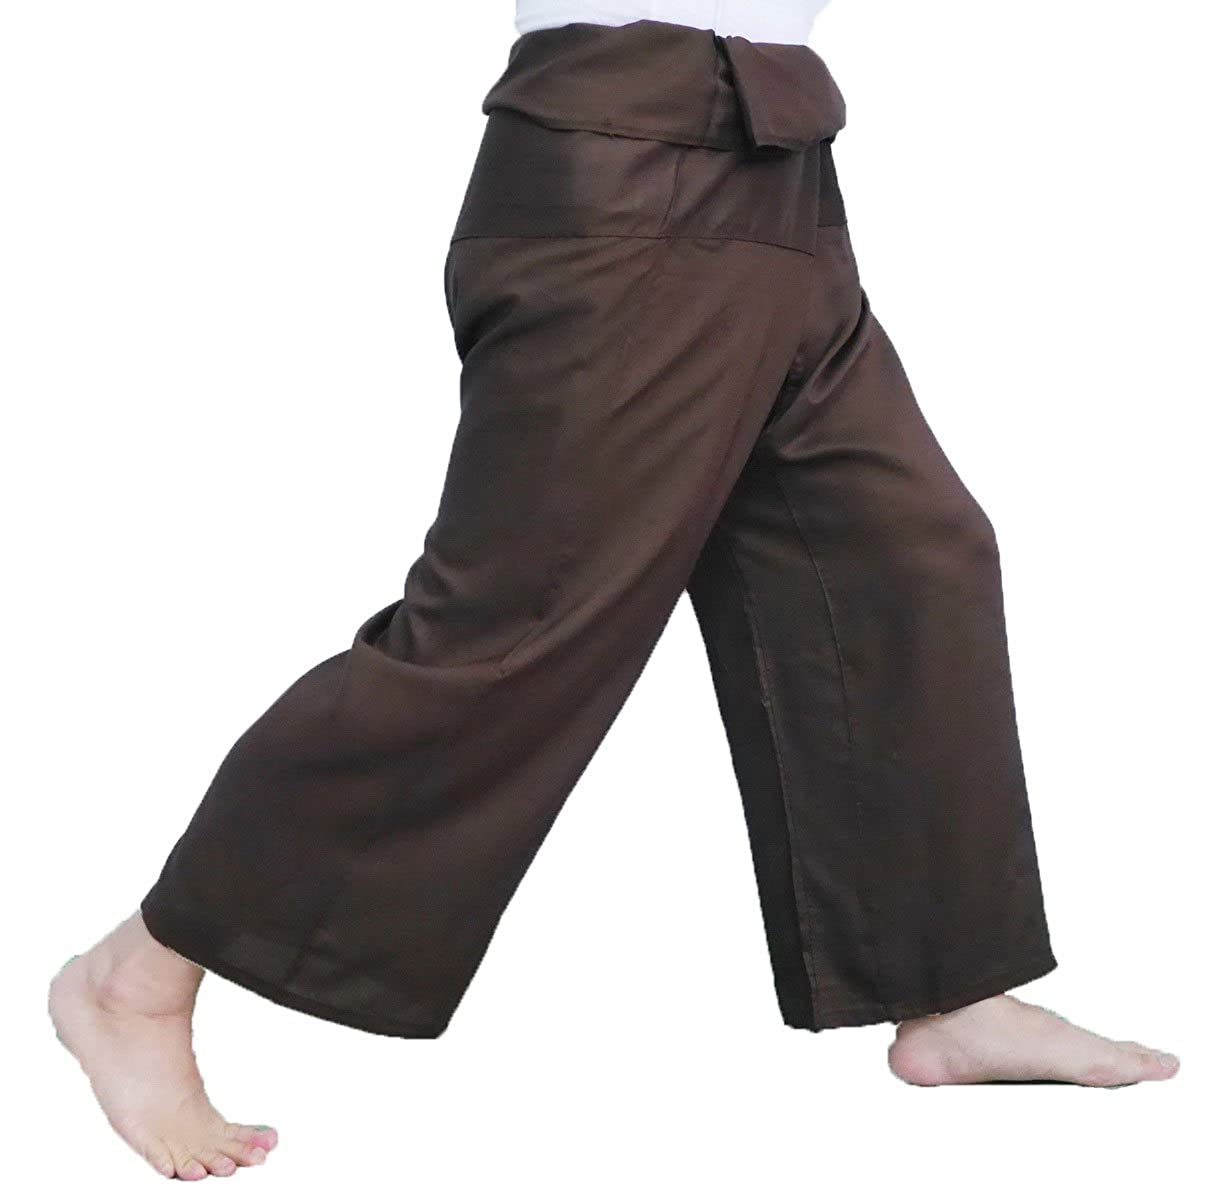 Brown Thai Massage Pants Thai Fisherman Pants yoga summer beach pants